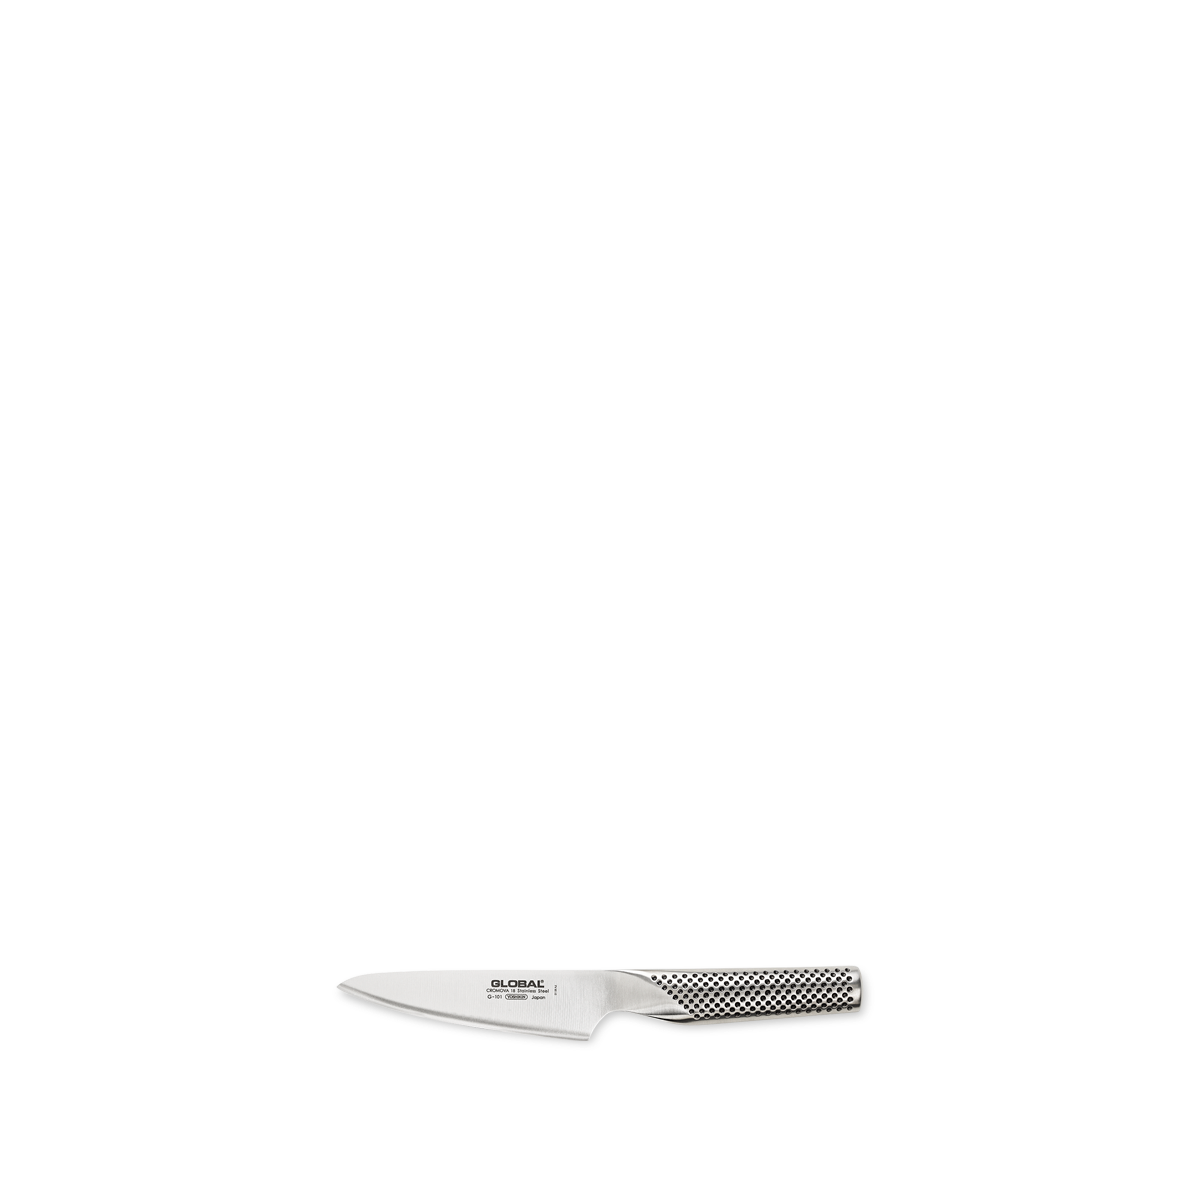 GLOBAL - G-101 Cook´s 13 cm - Steel (17181)